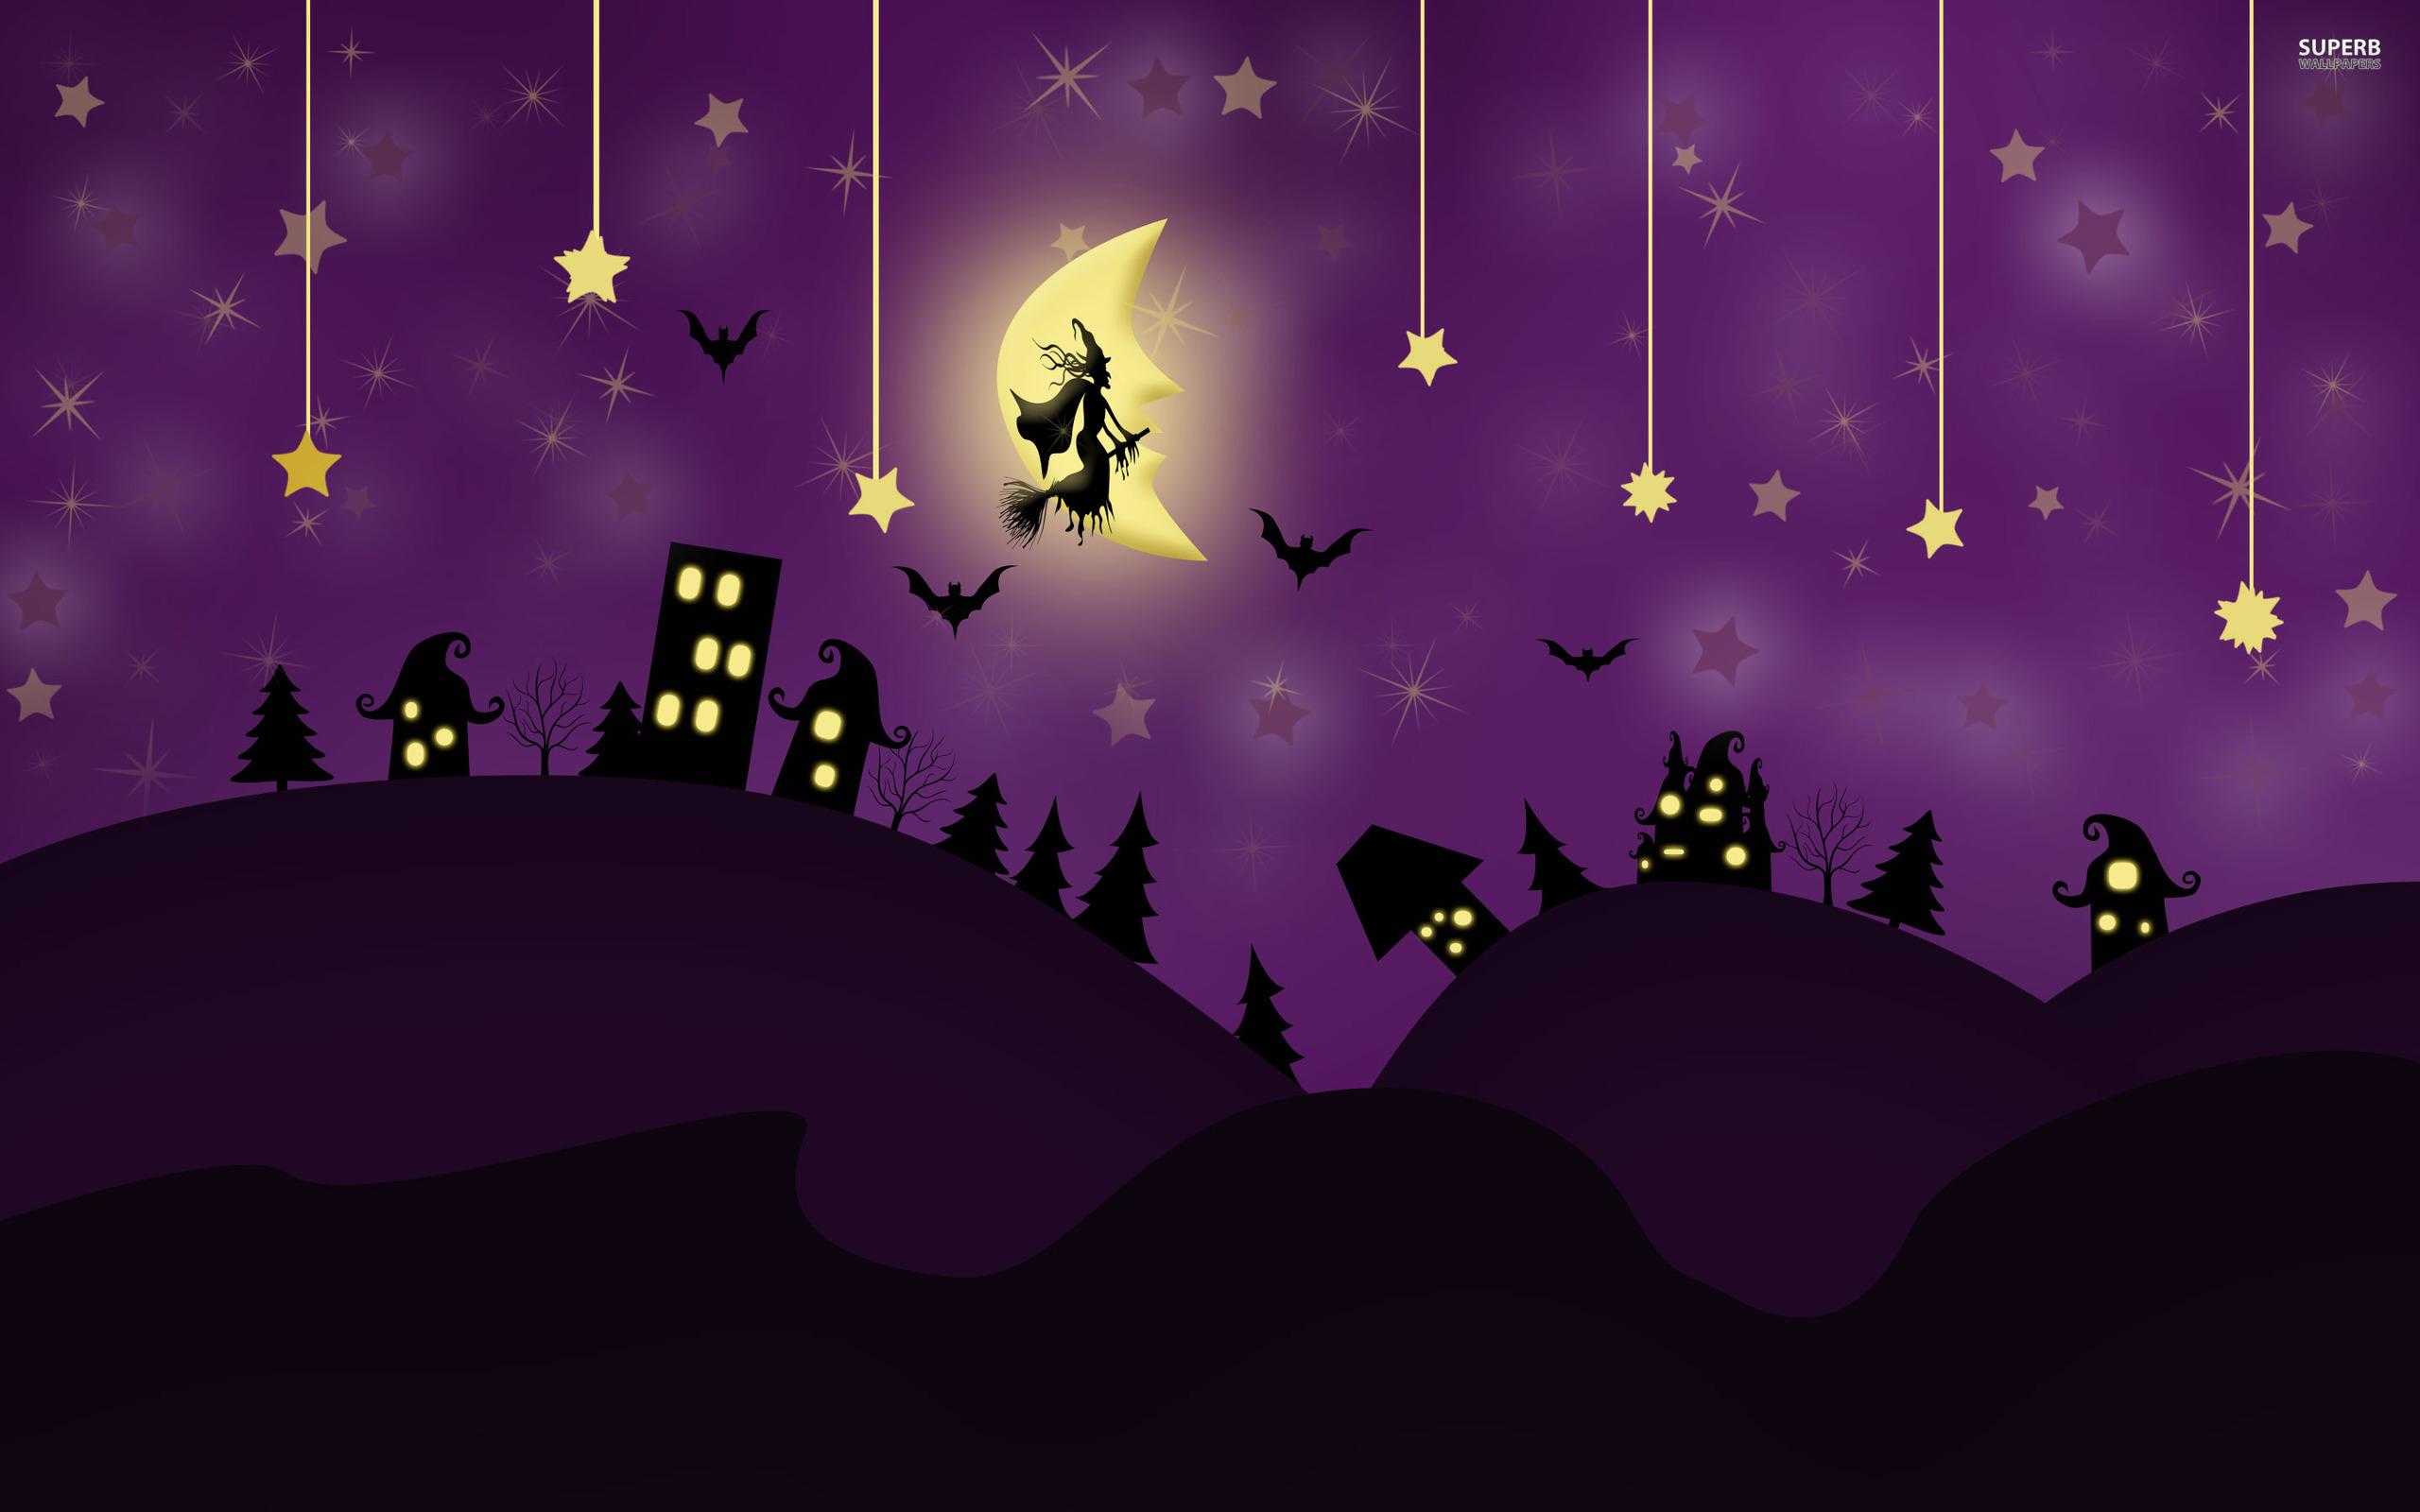 Top Wallpaper Halloween Purple - b17fd99e3460db70edc771ae45c2d460  Perfect Image Reference_639218.jpg